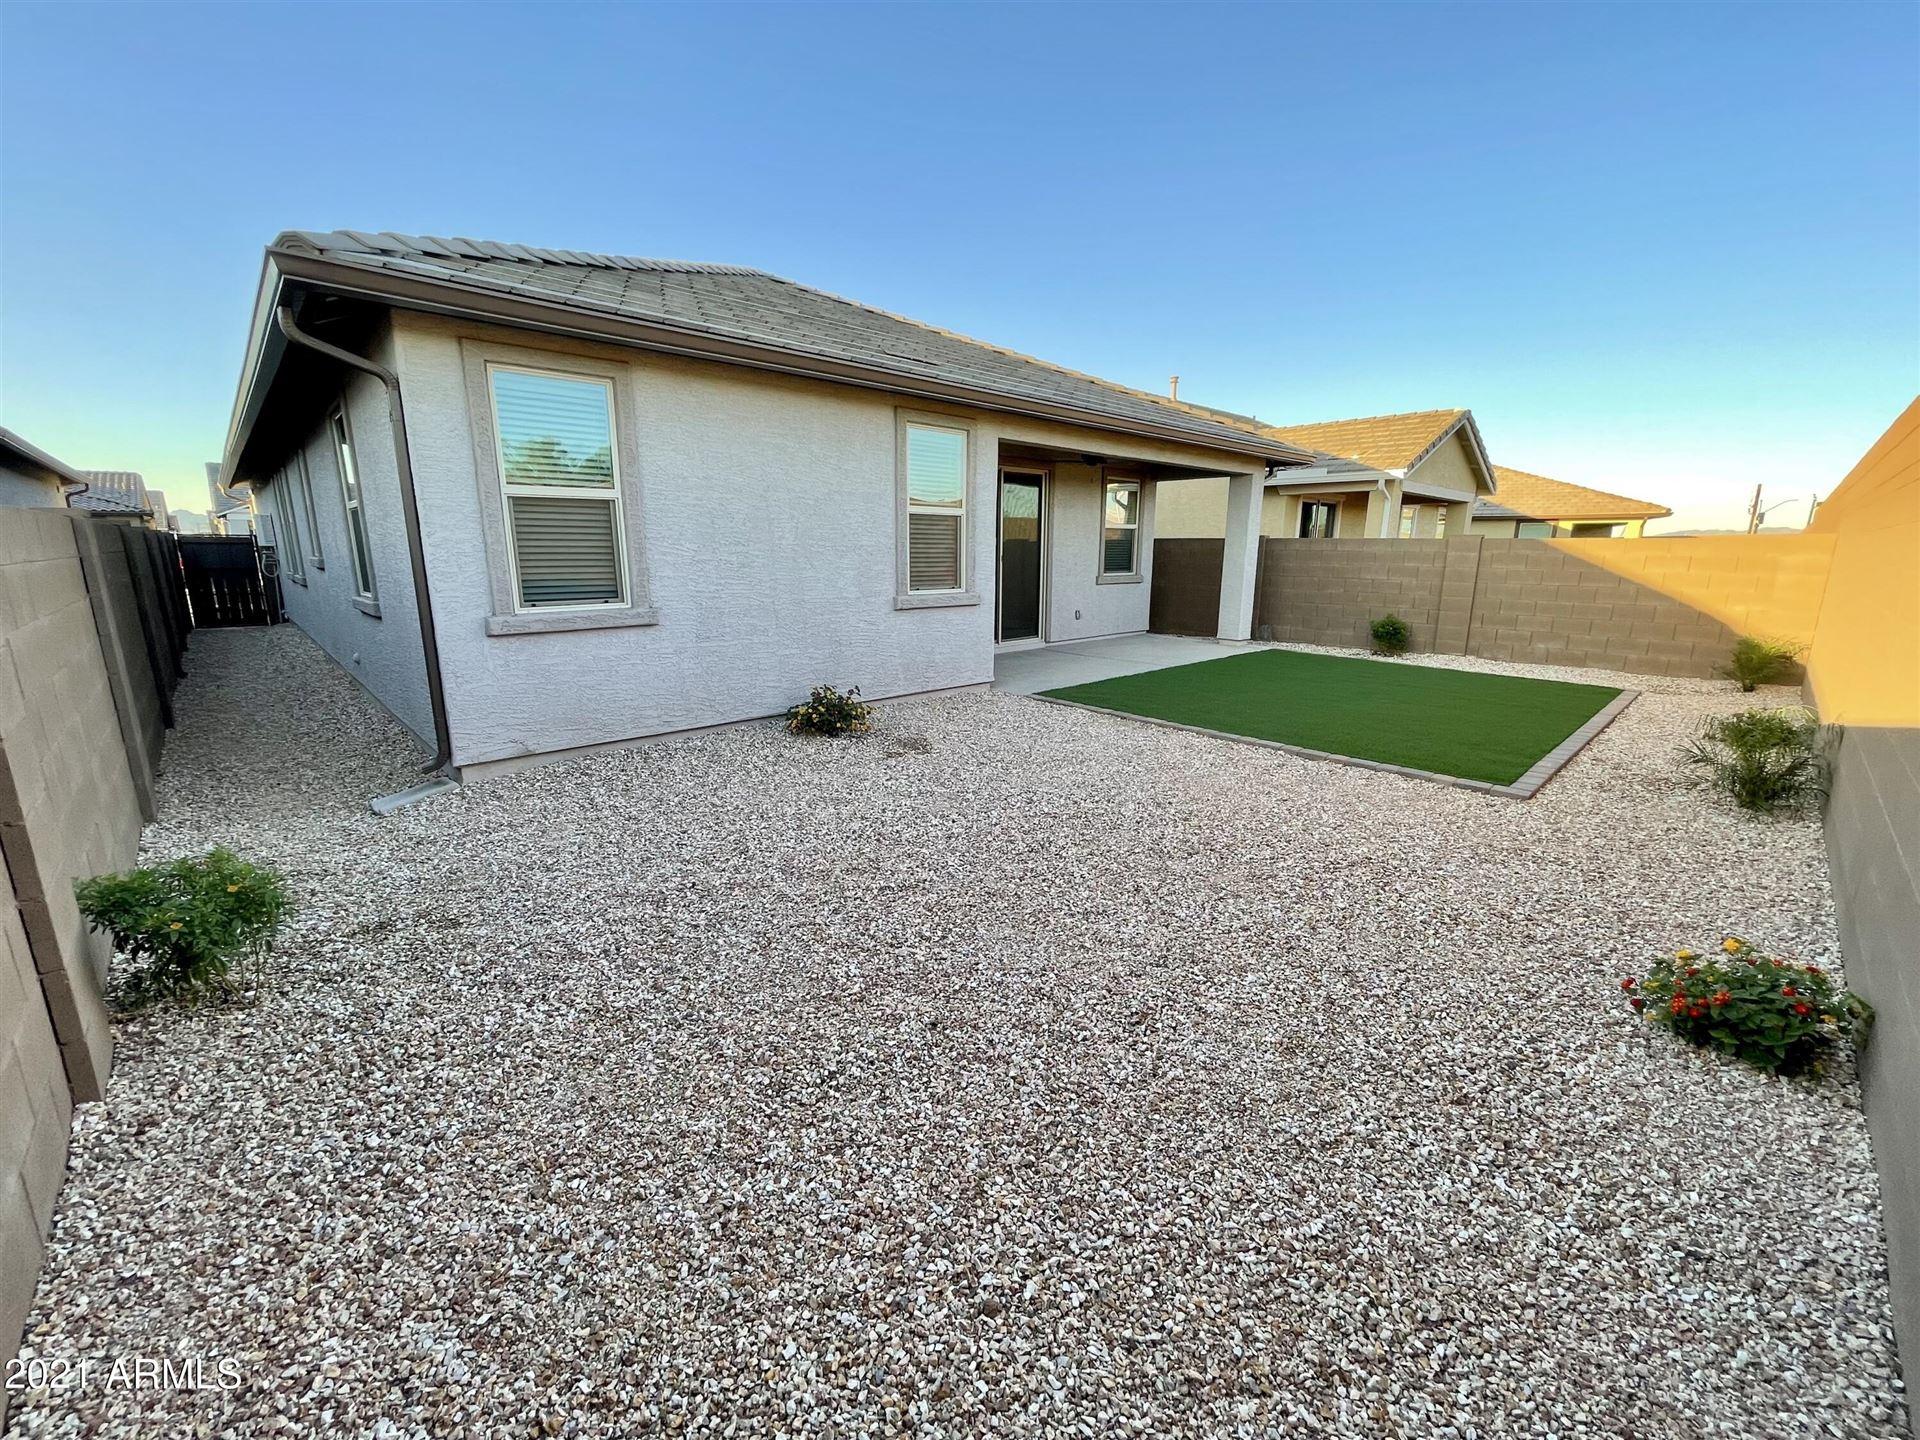 Photo of 9006 W PALO VERDE Drive, Glendale, AZ 85305 (MLS # 6307913)